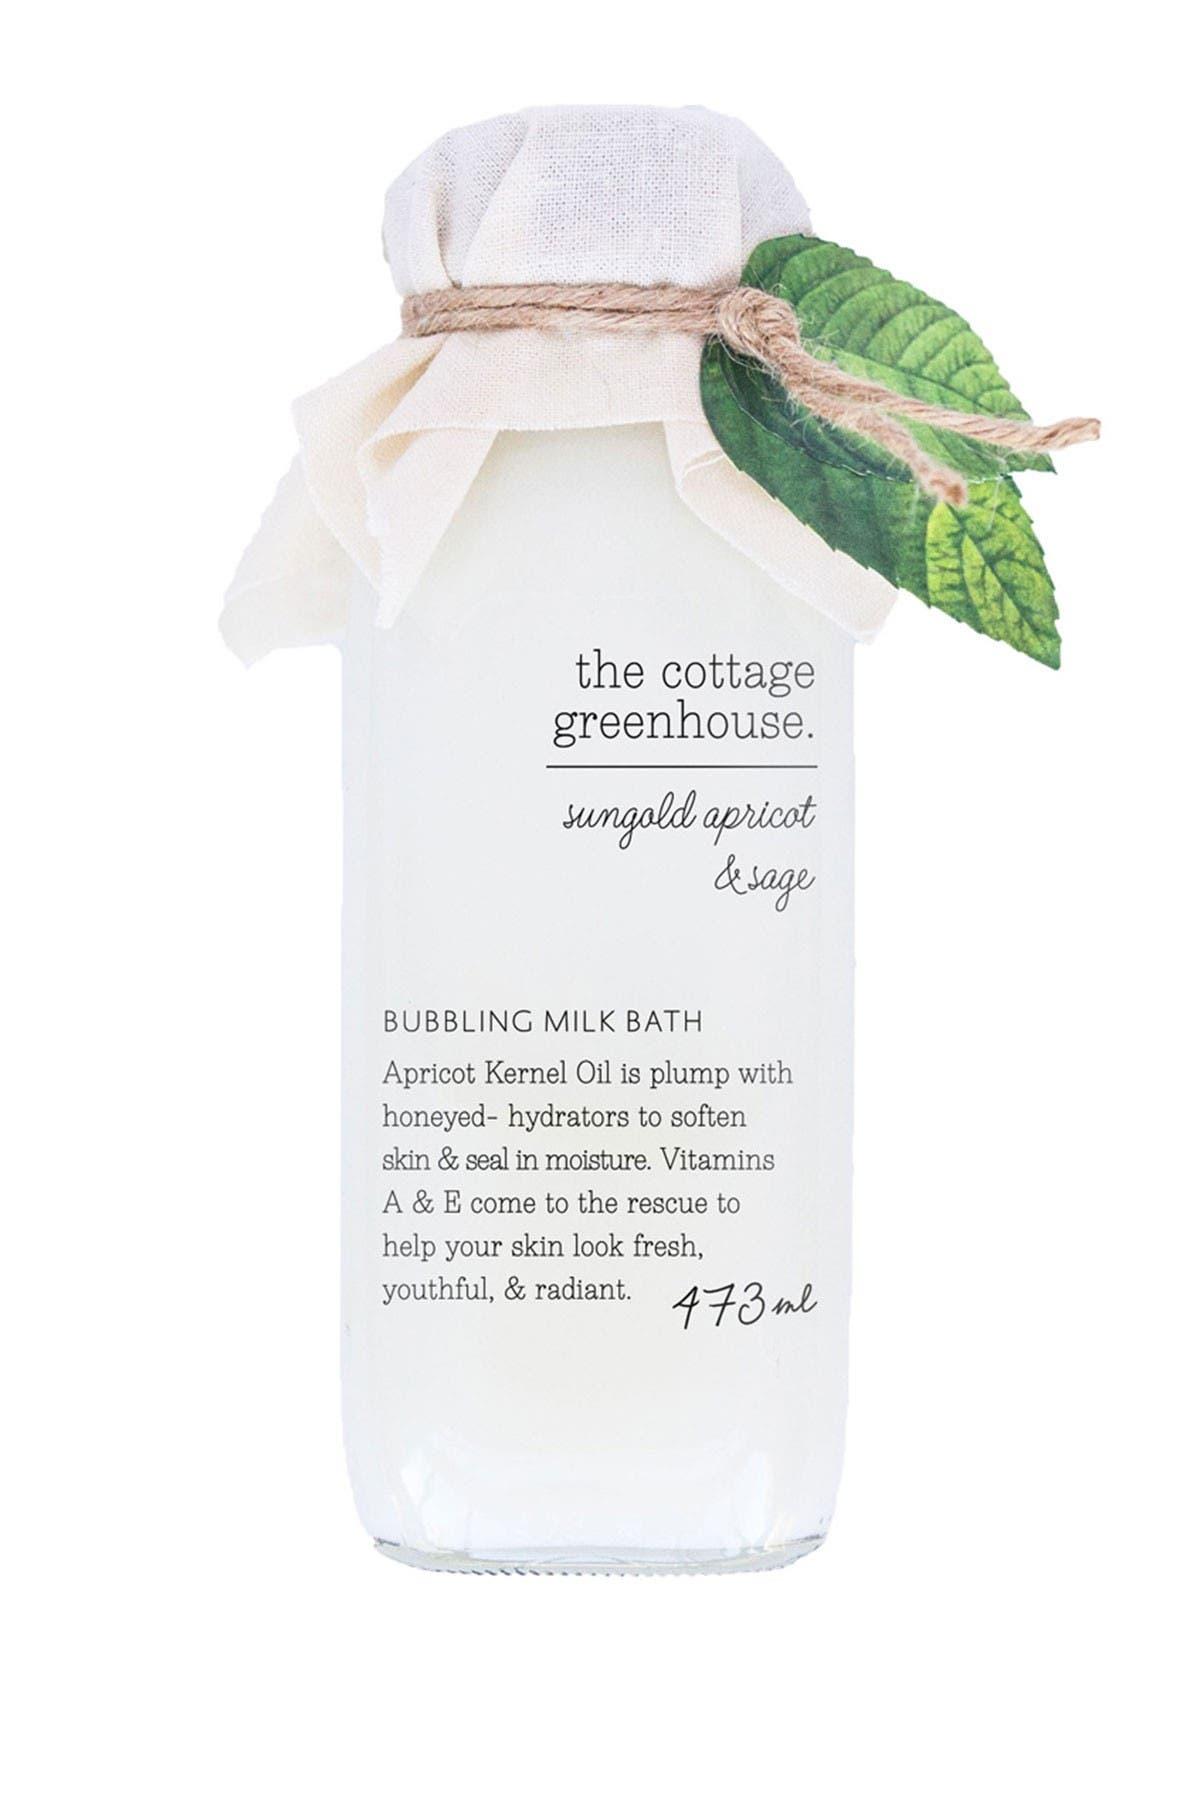 Image of TokyoMilk Sungold Apricot & Sage Bubbling Milk Bath